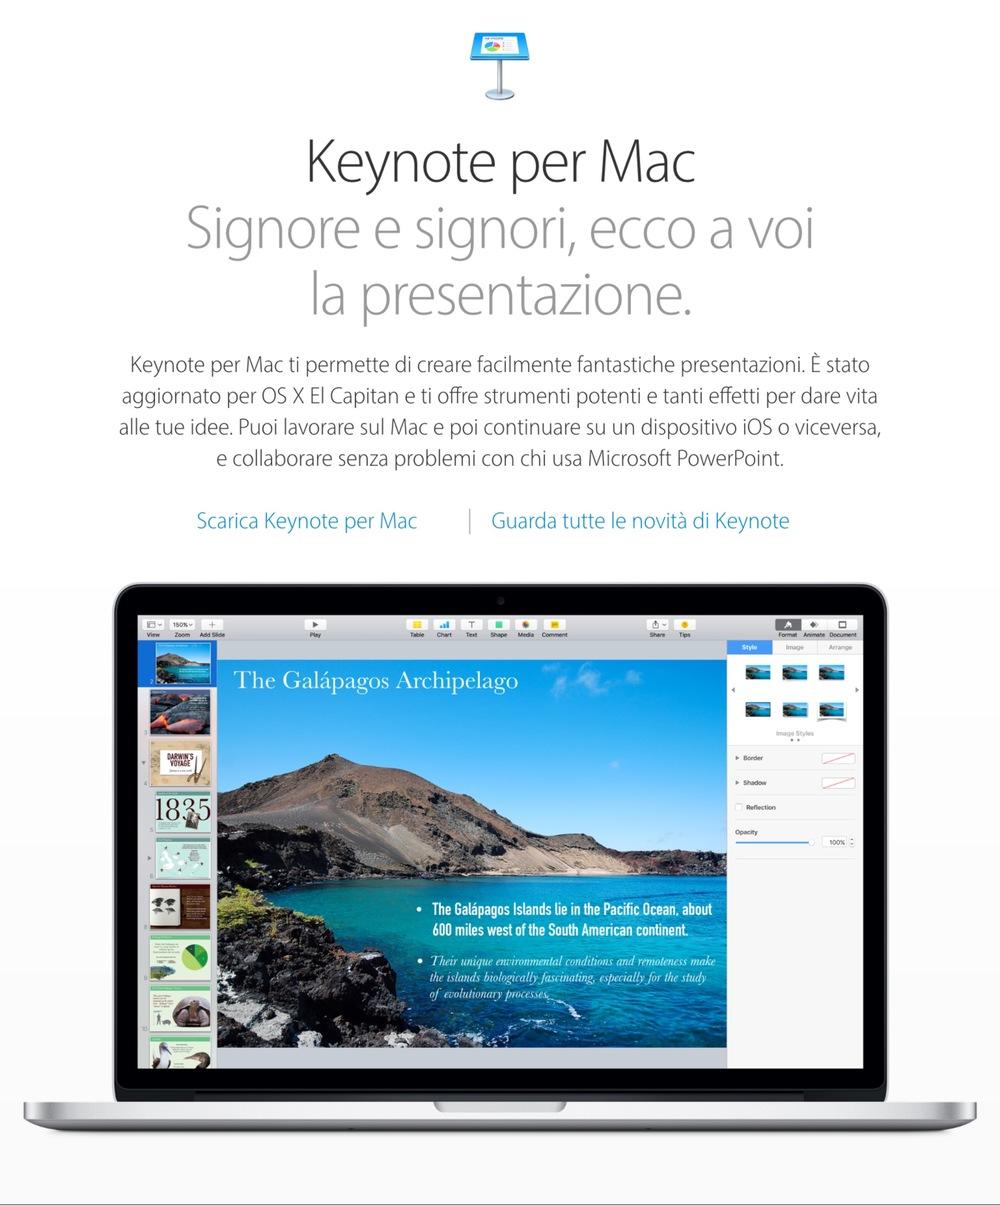 Screenshot della pagina introduttiva di Apple per Keynote